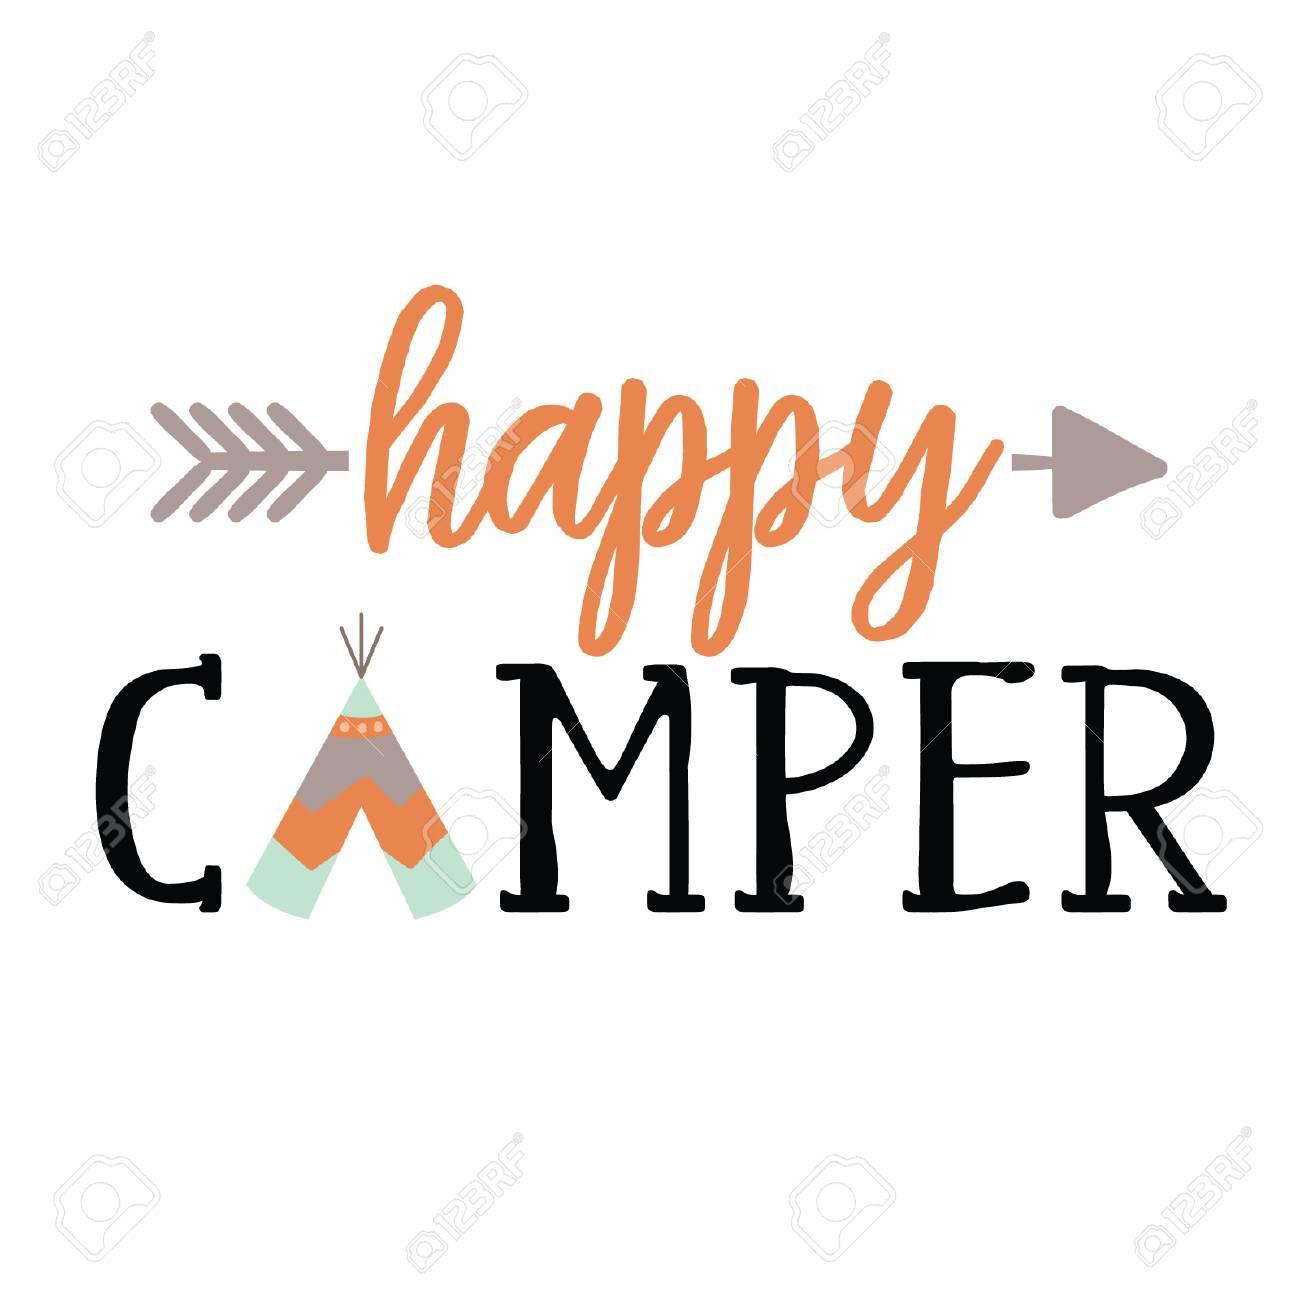 Happy Camper Vector Tribal Arrow Camping Tee Pee Native American